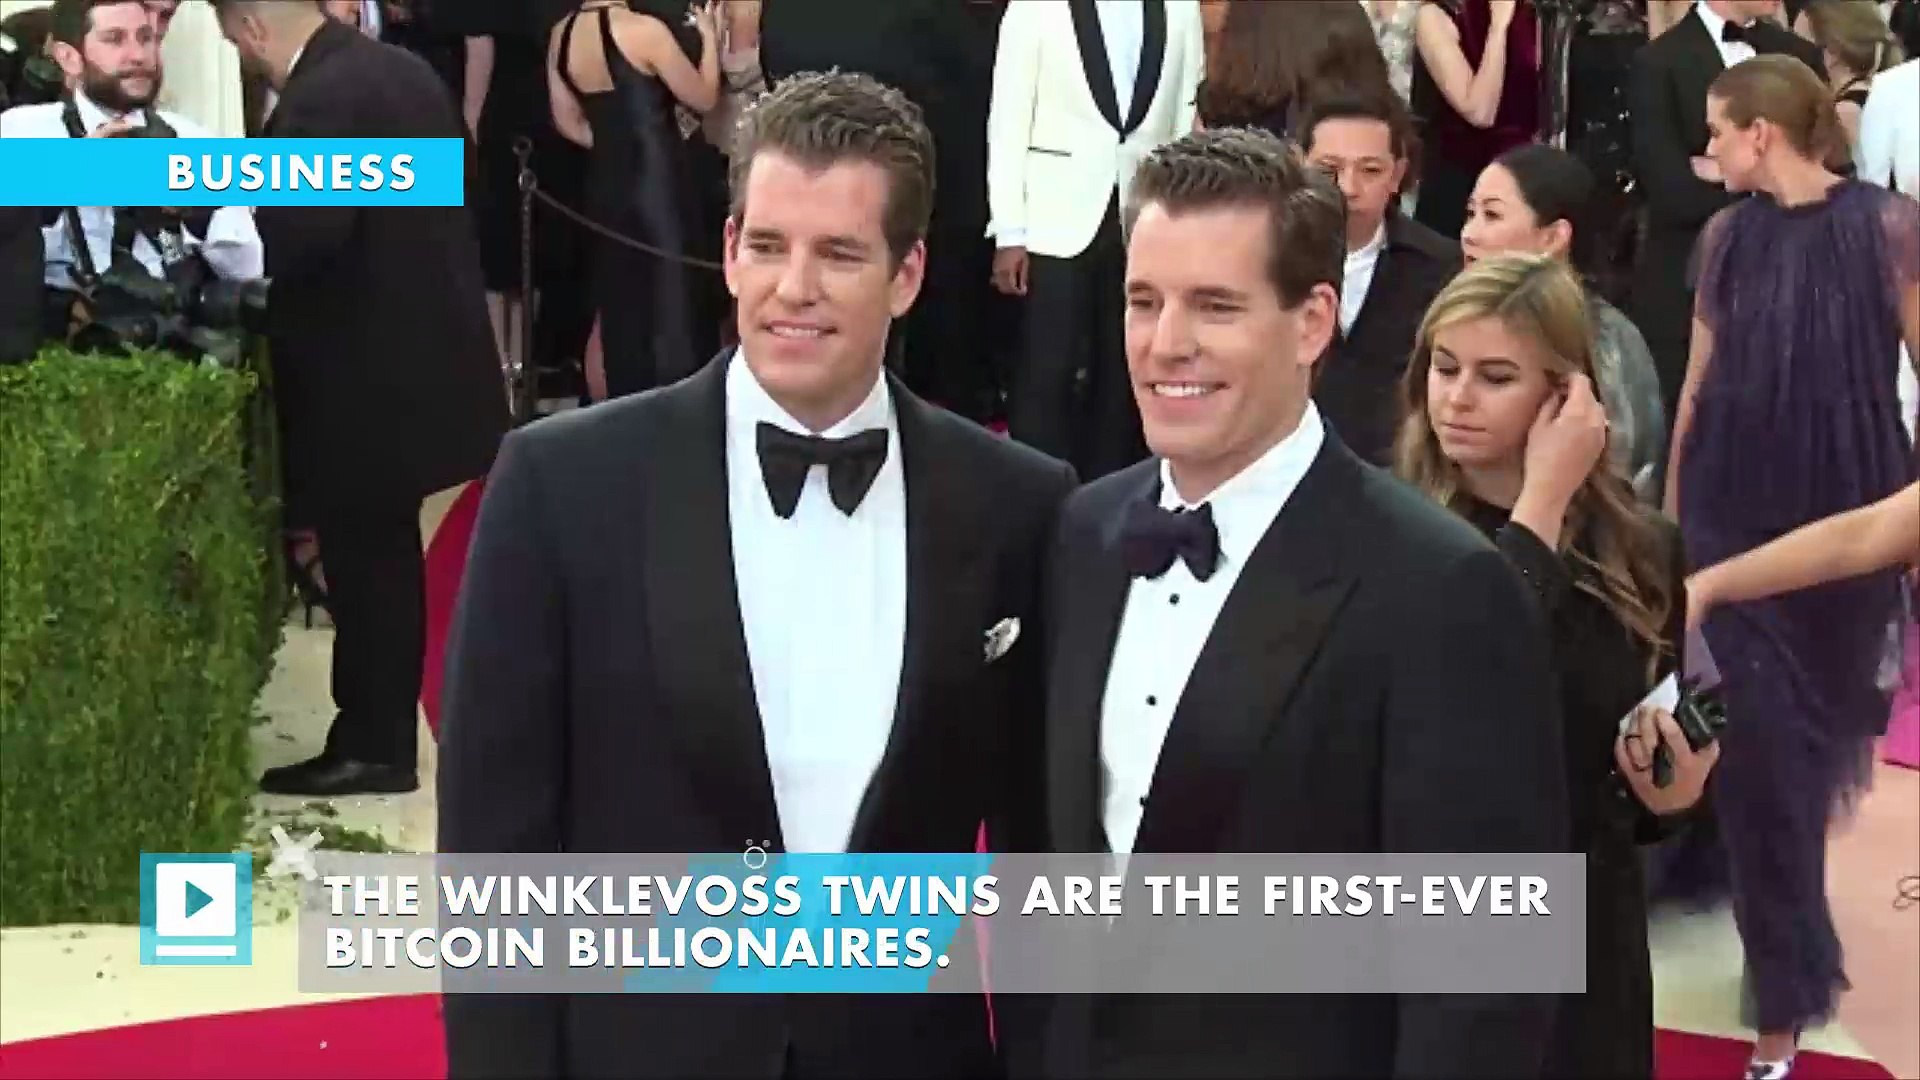 Winklevoss twins earn title of first bitcoin billionaires